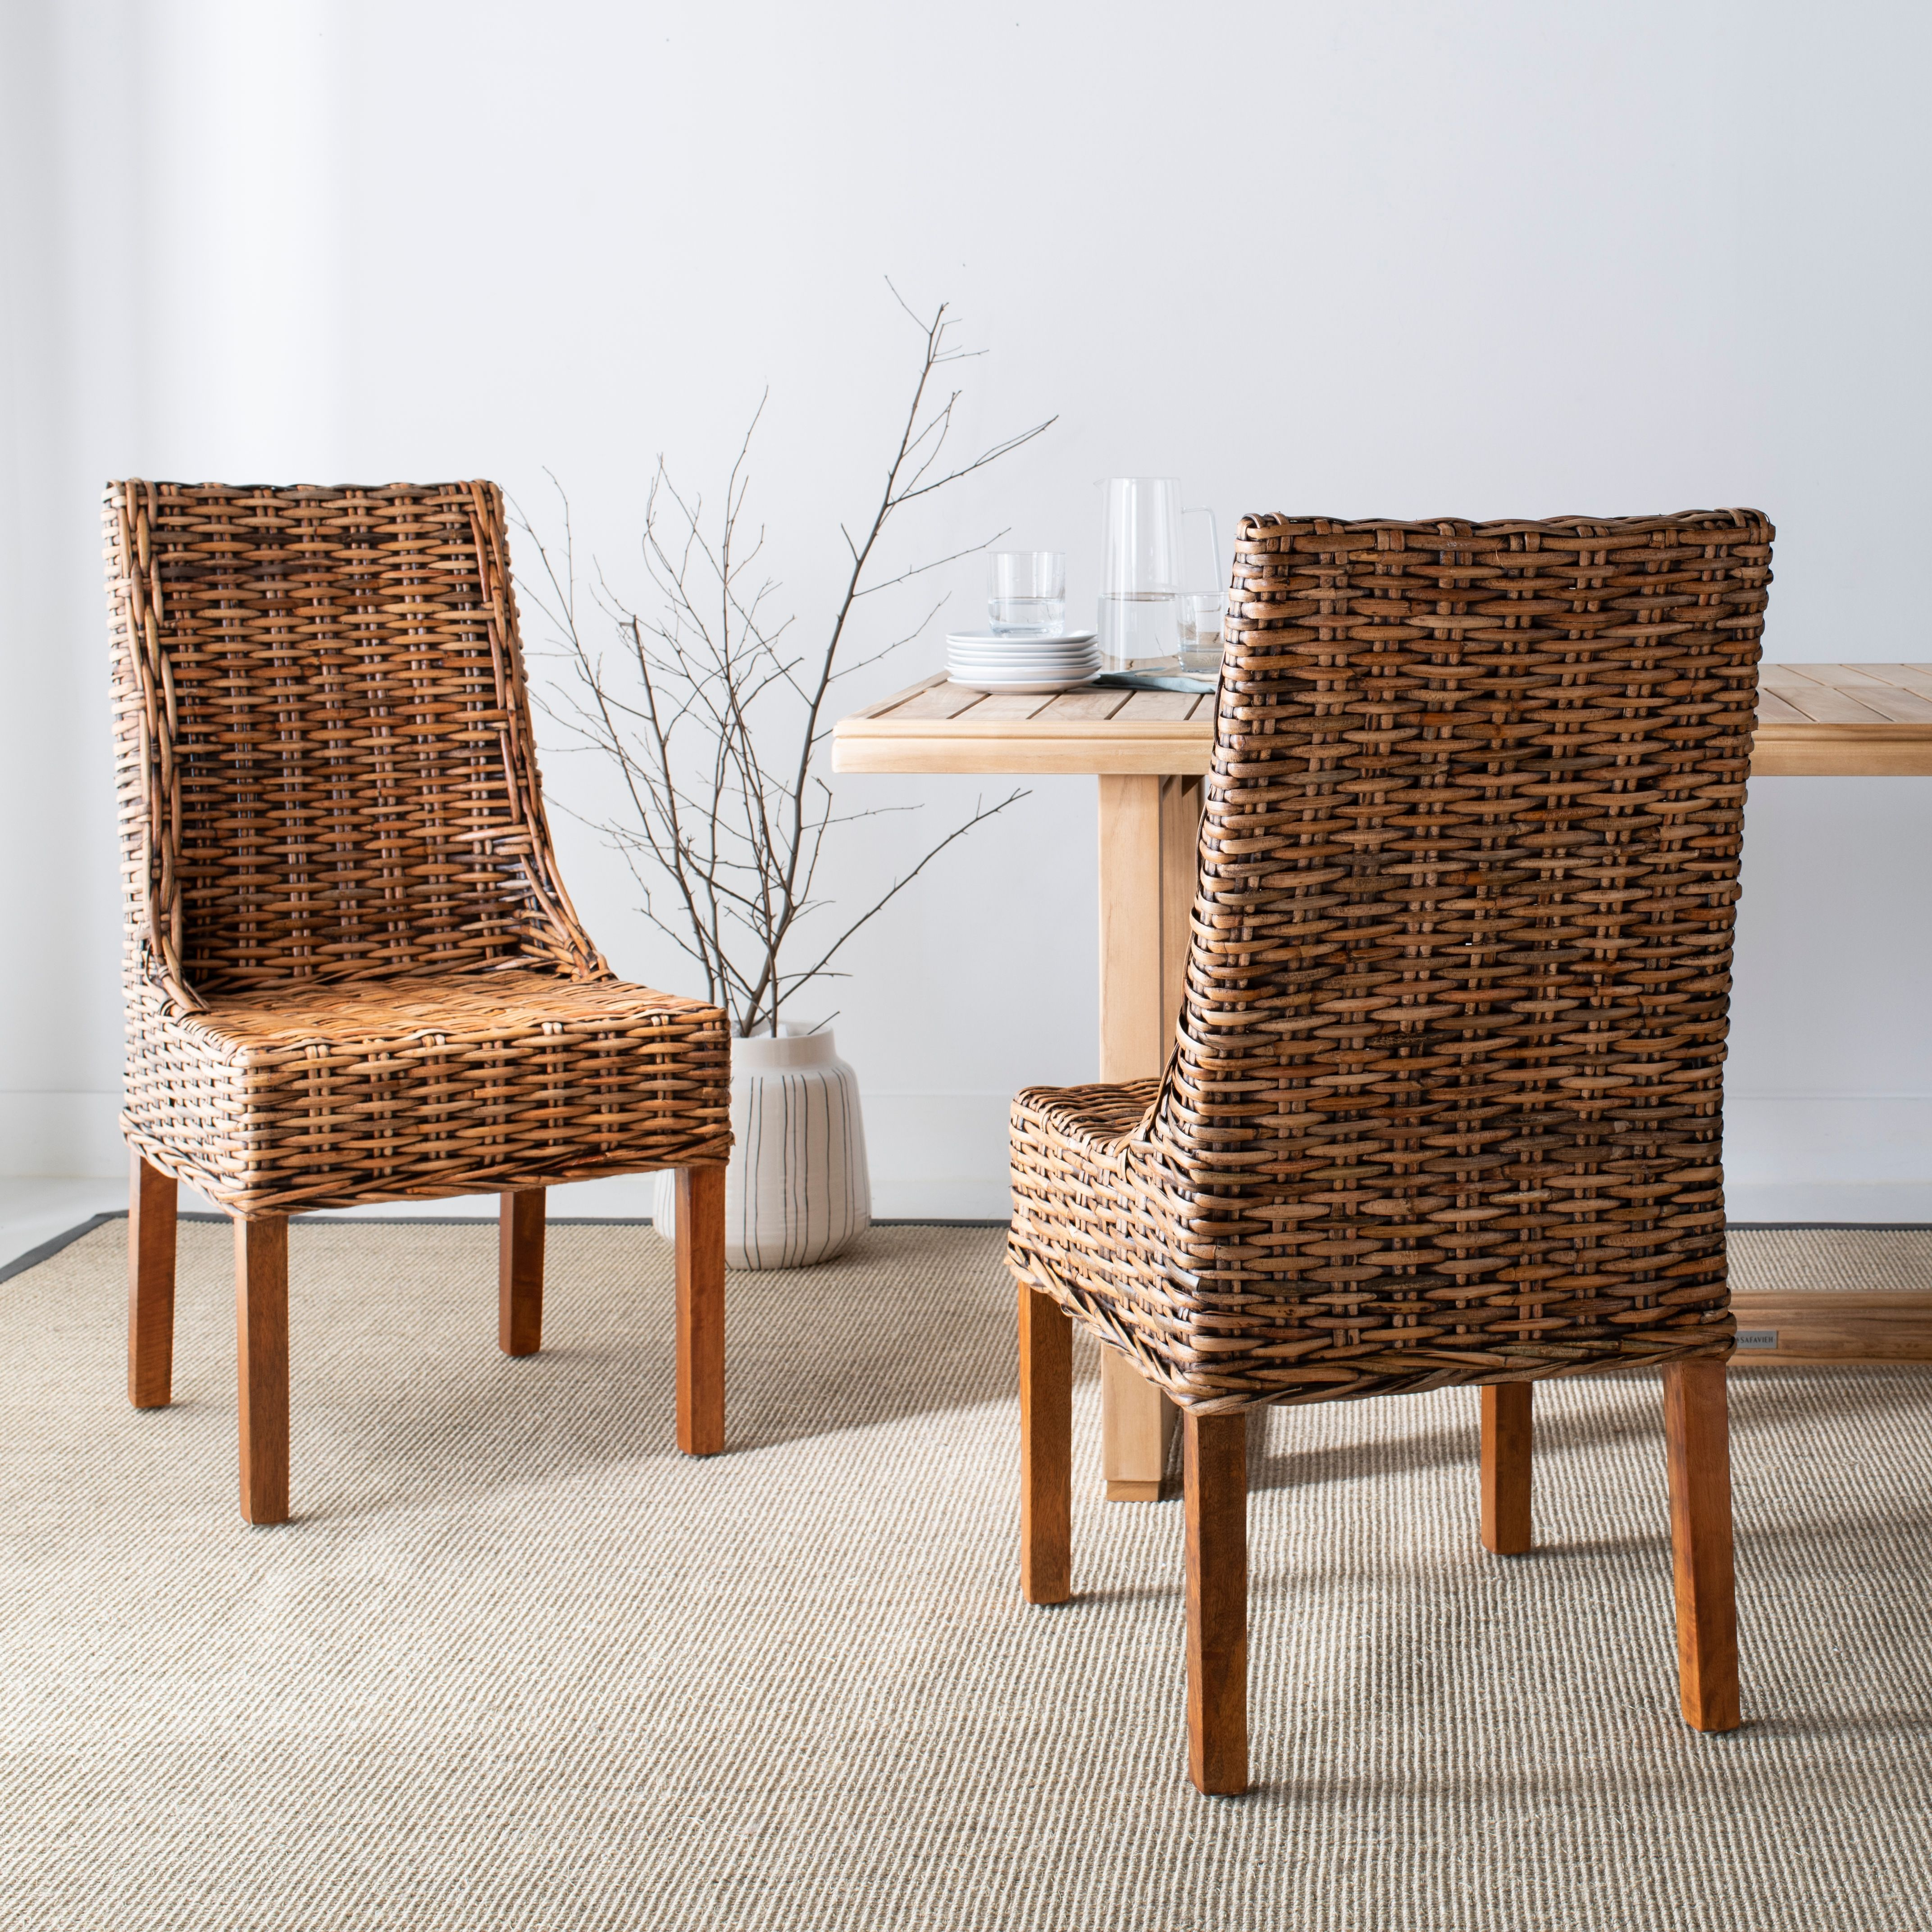 24+ Rattan dining chair set Various Types